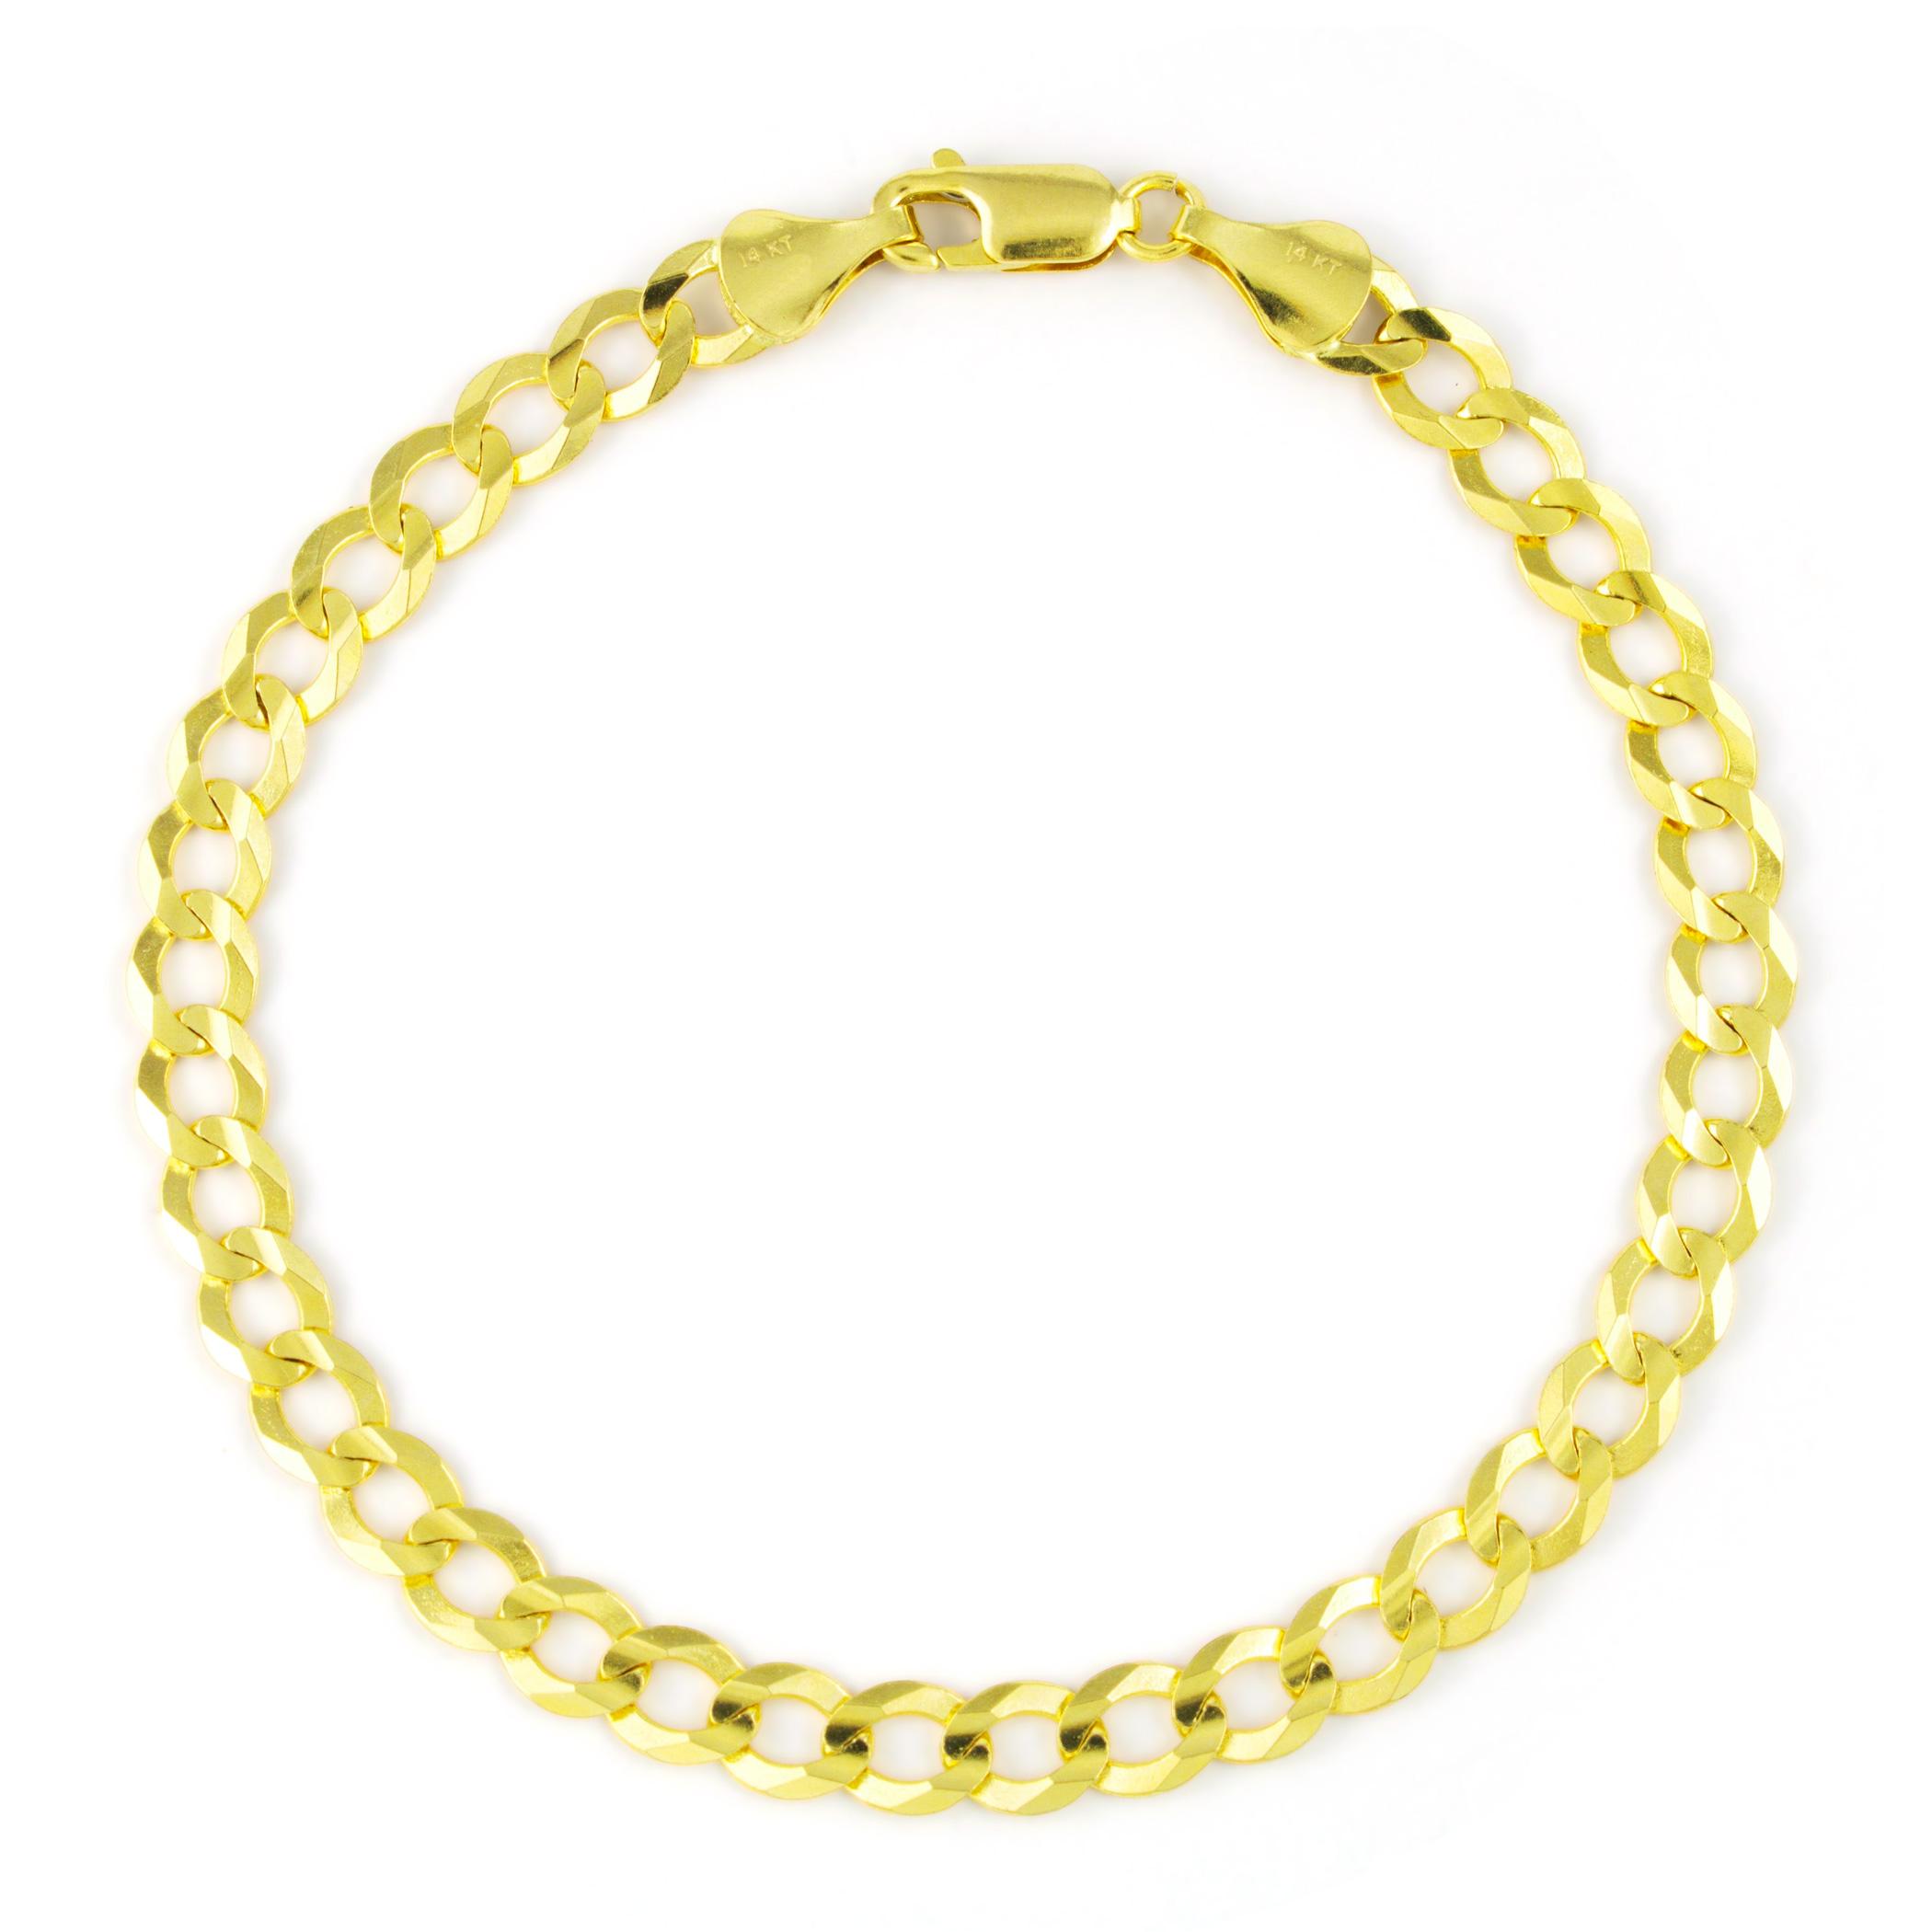 14K-Yellow-Gold-5-5mm-Italian-Curb-Cuban-Link-Chain-Bracelet-Mens-Women-7-034-8-034-9-034 thumbnail 12